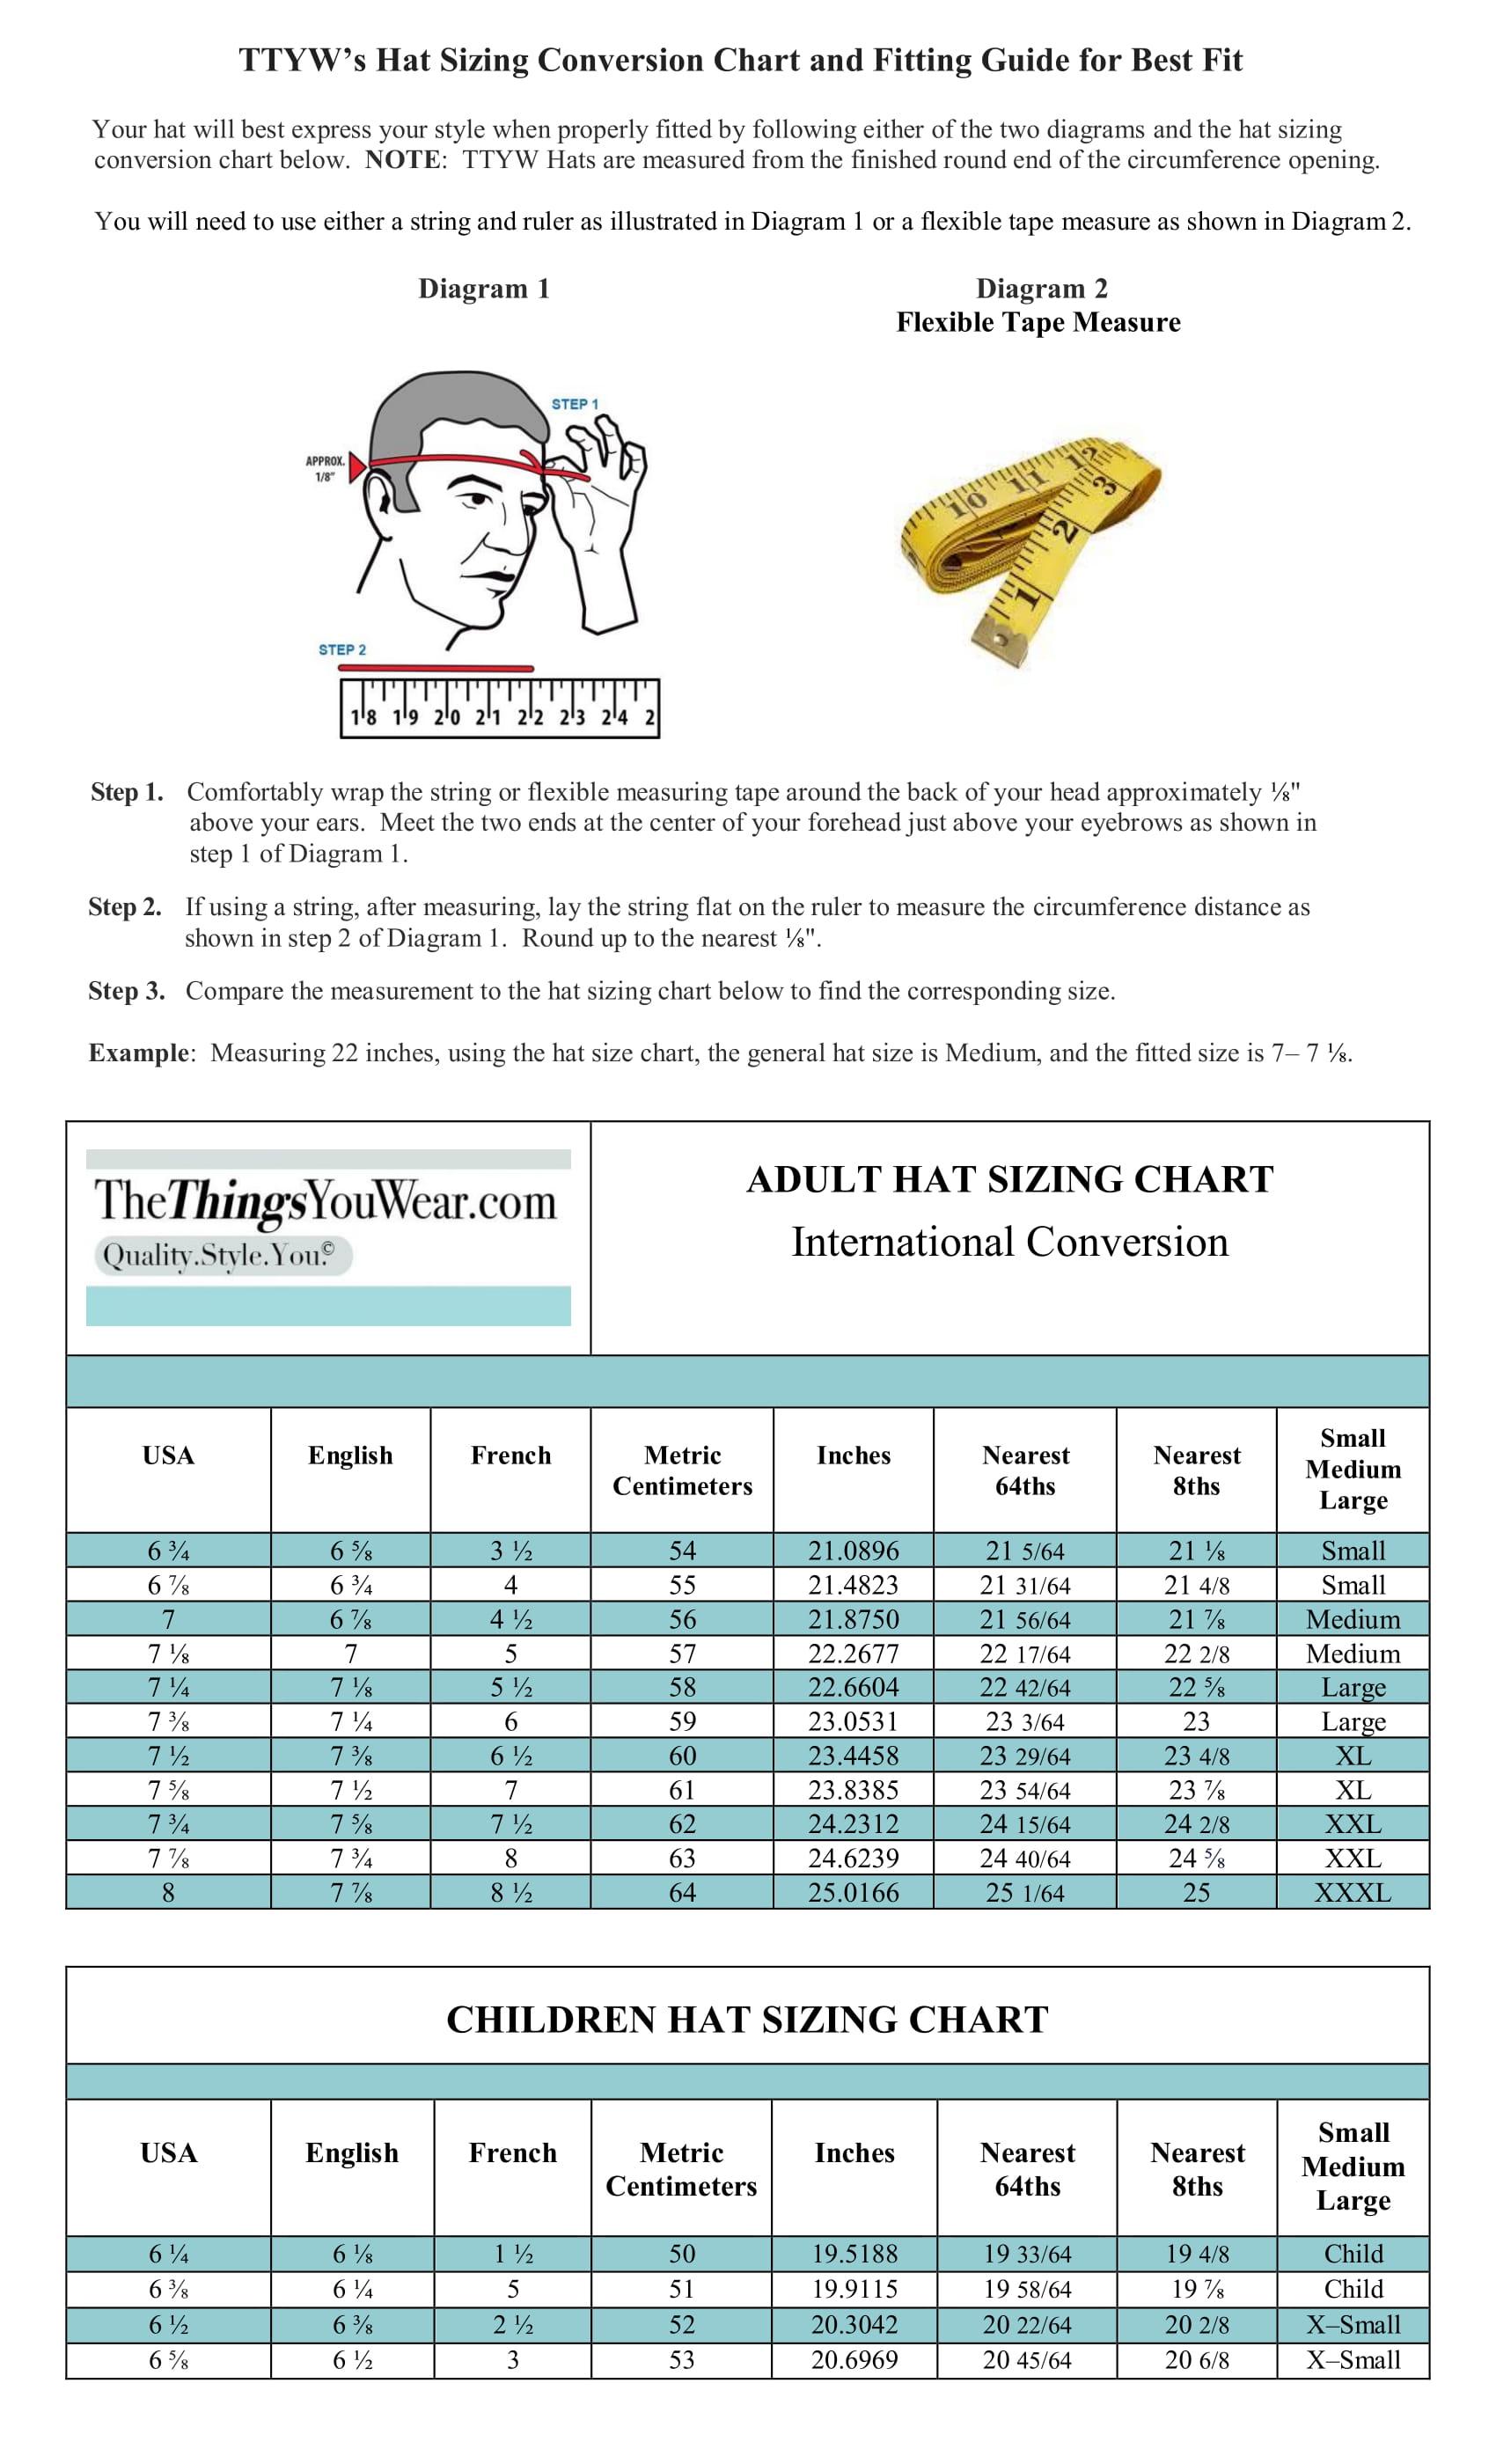 ttwy-s-hat-conversion-chart-1.jpg